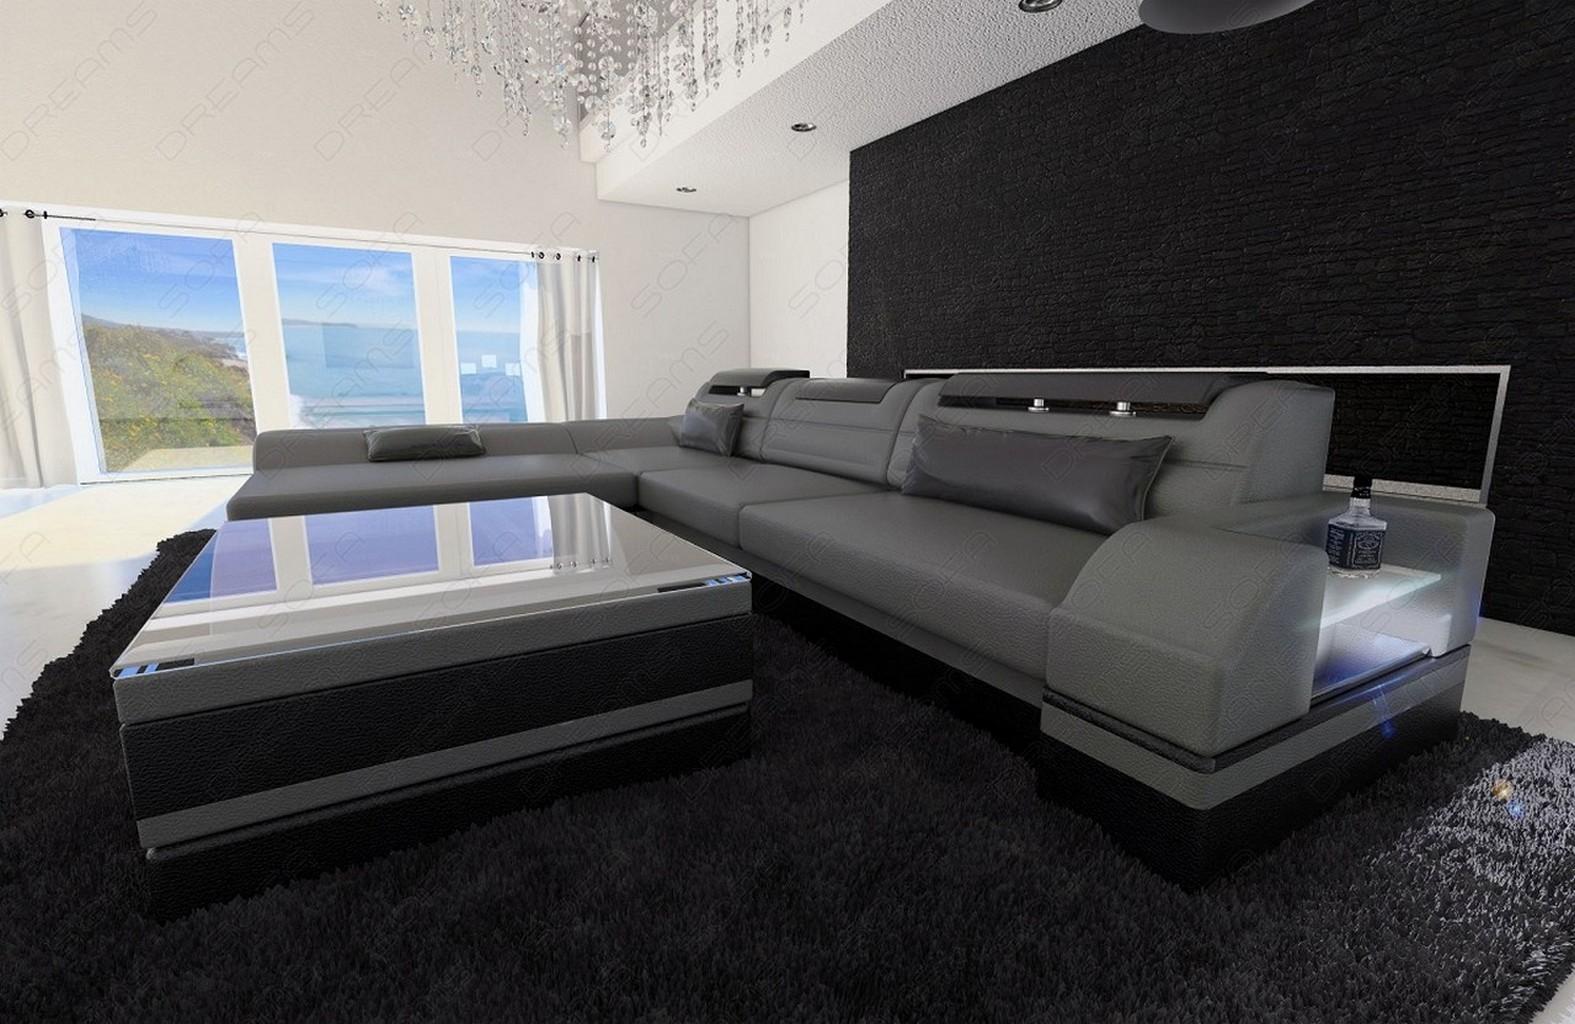 Designersofa monza l form grau schwarz mit led beleuchtung - Sofa l form grau ...